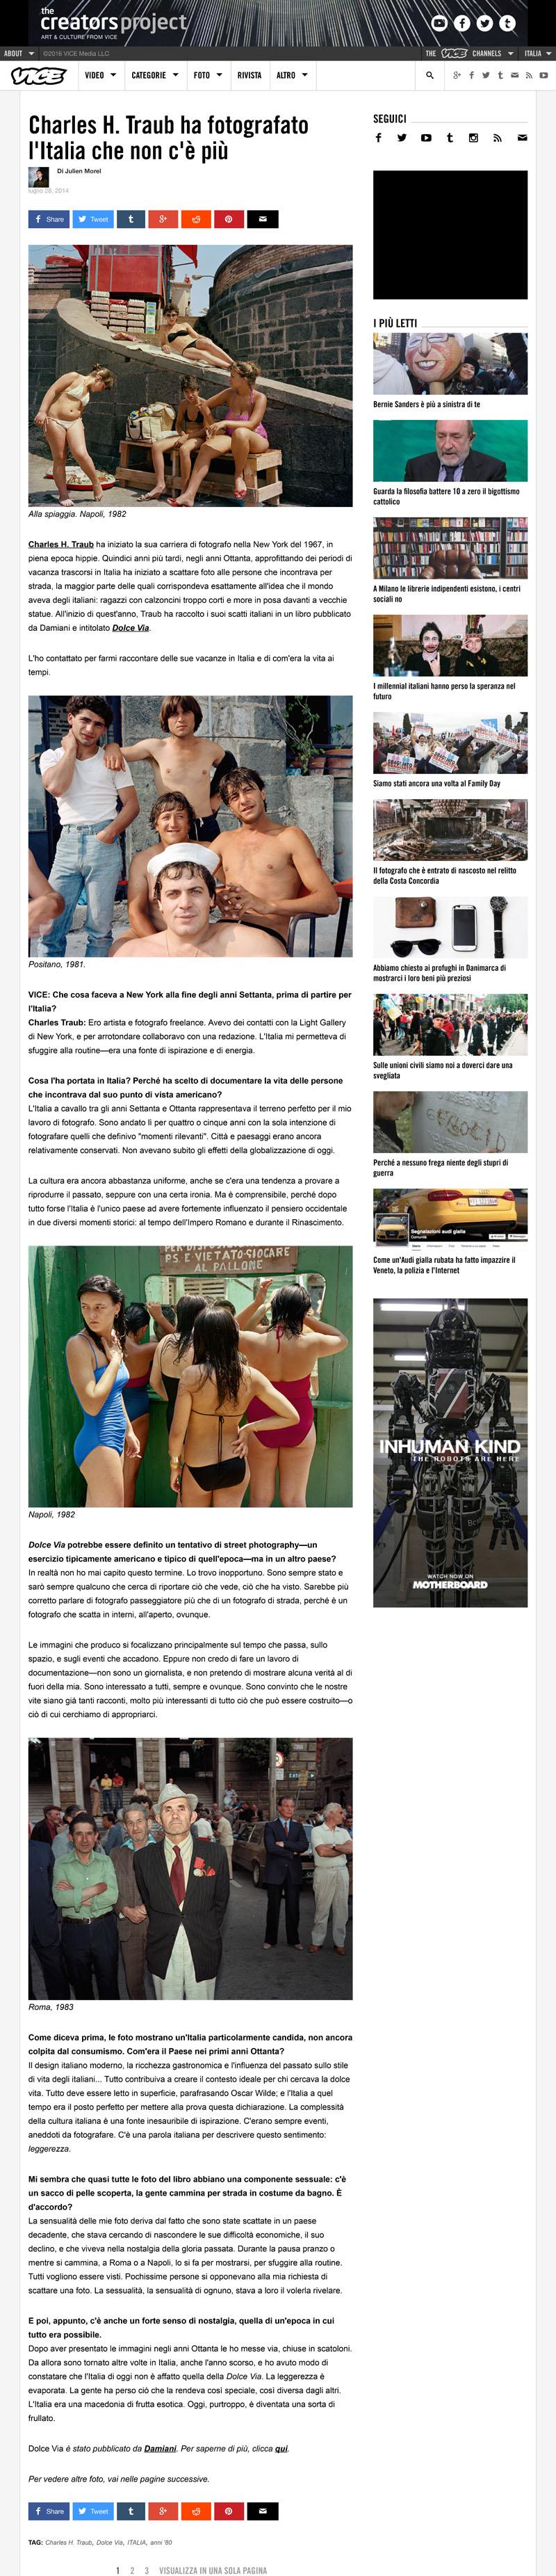 Vice_July_28_2014.jpg